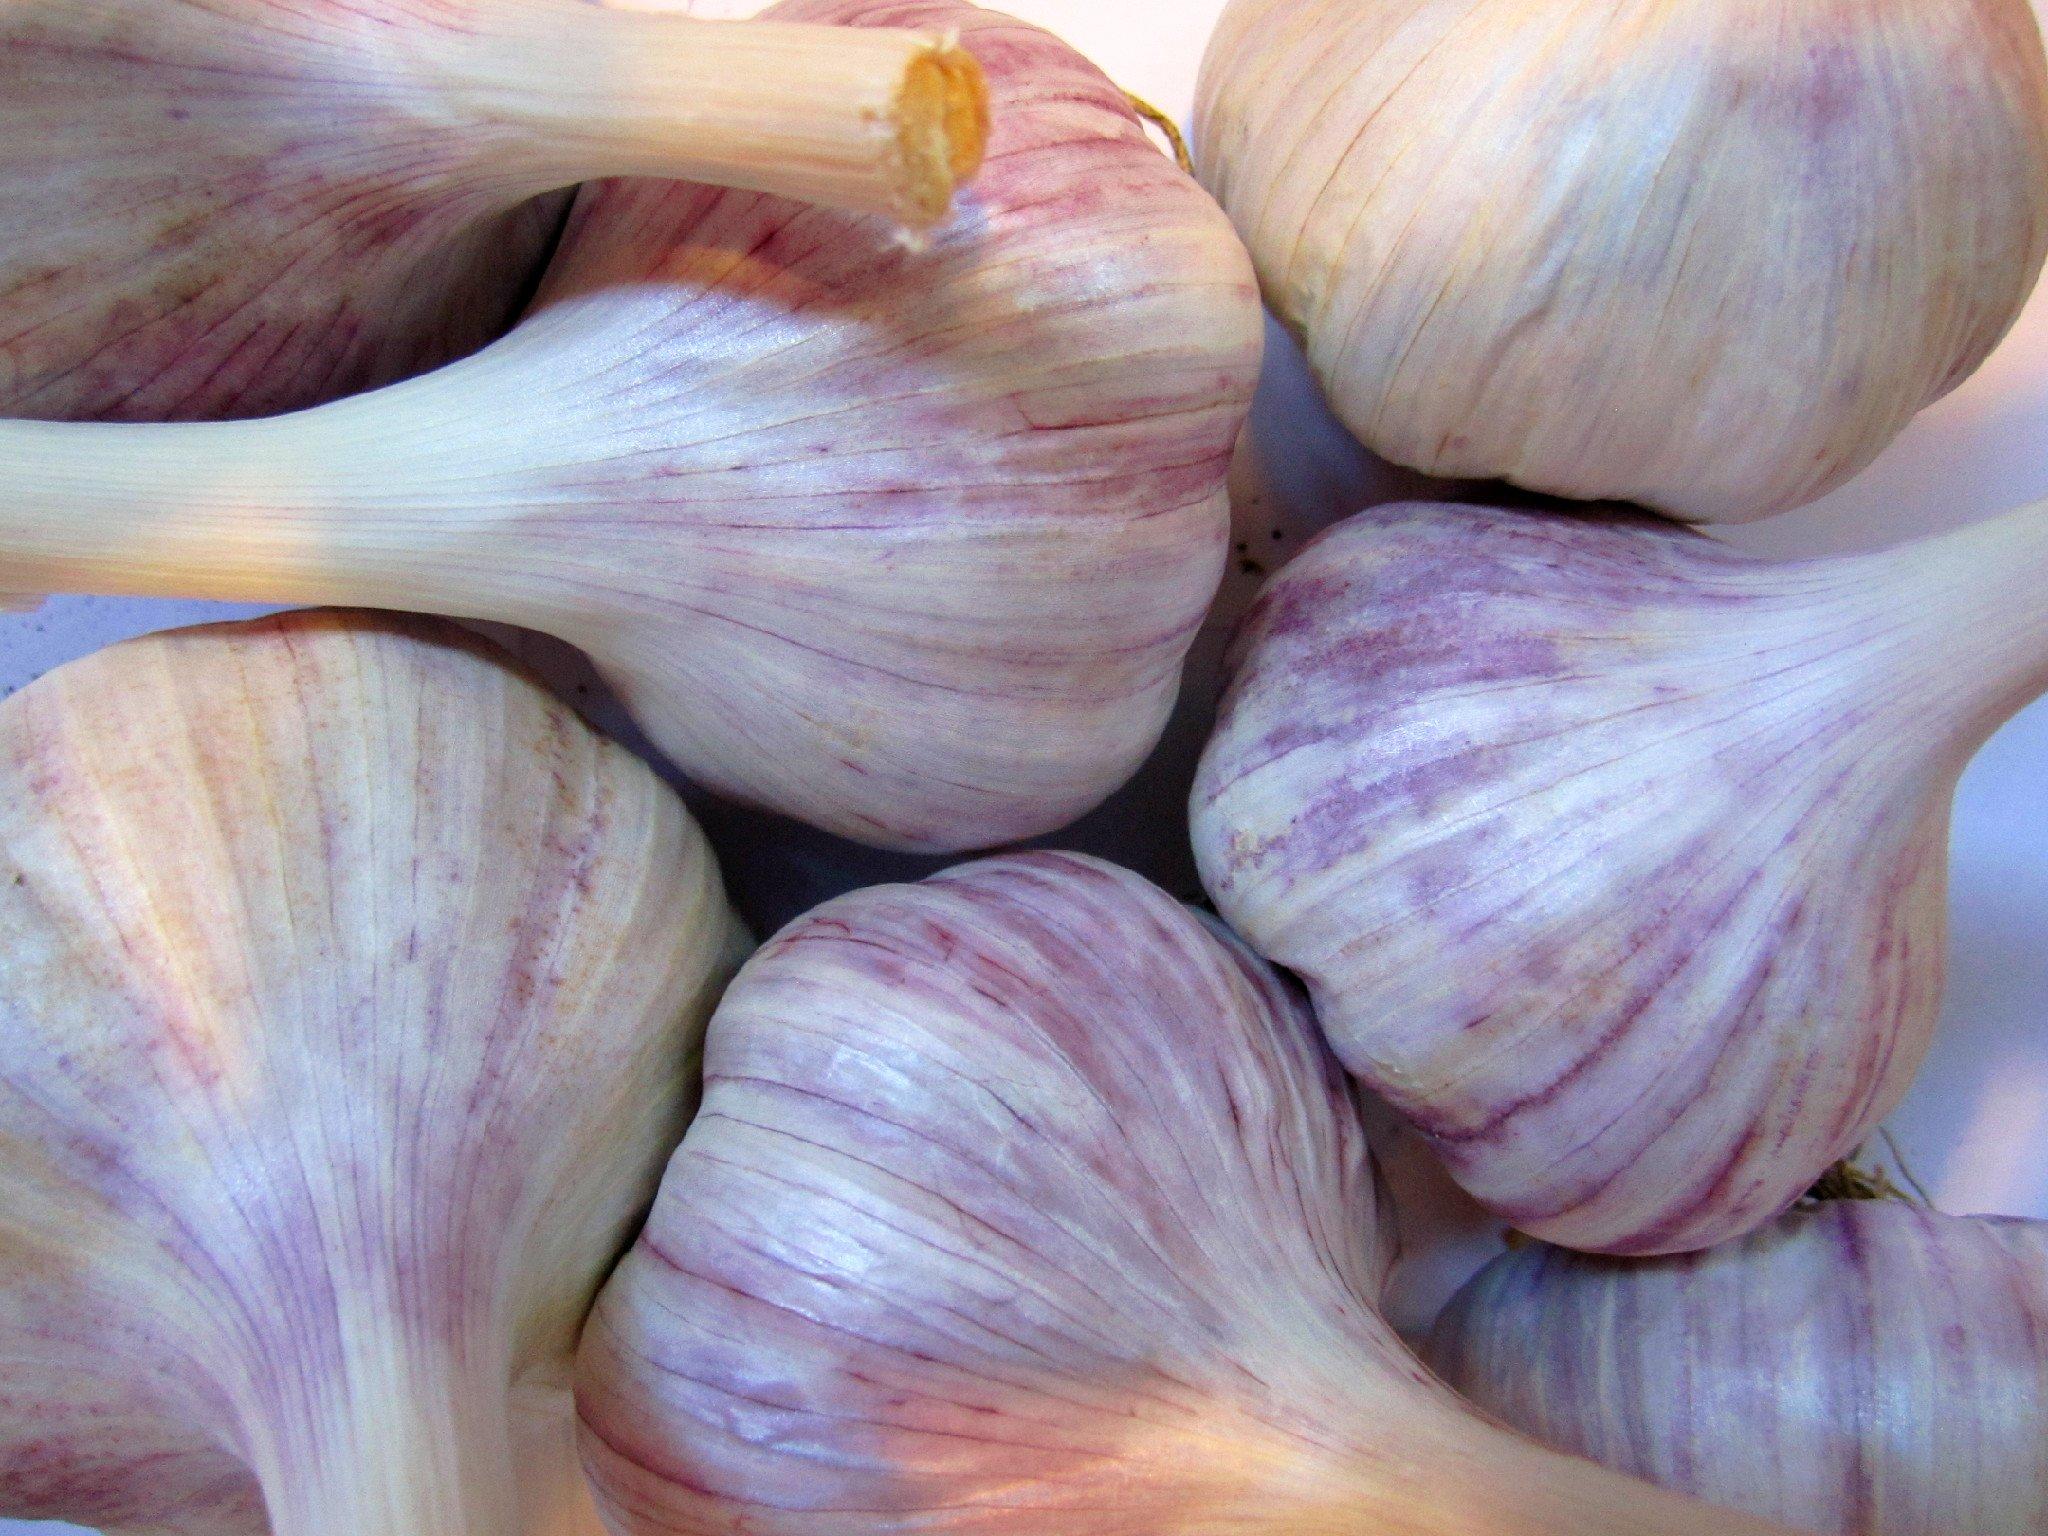 Persian Star Heirloom Garlic (5 Pound) Organic Gourmet Hardneck Garlic Bulbs by Marvelous Roots